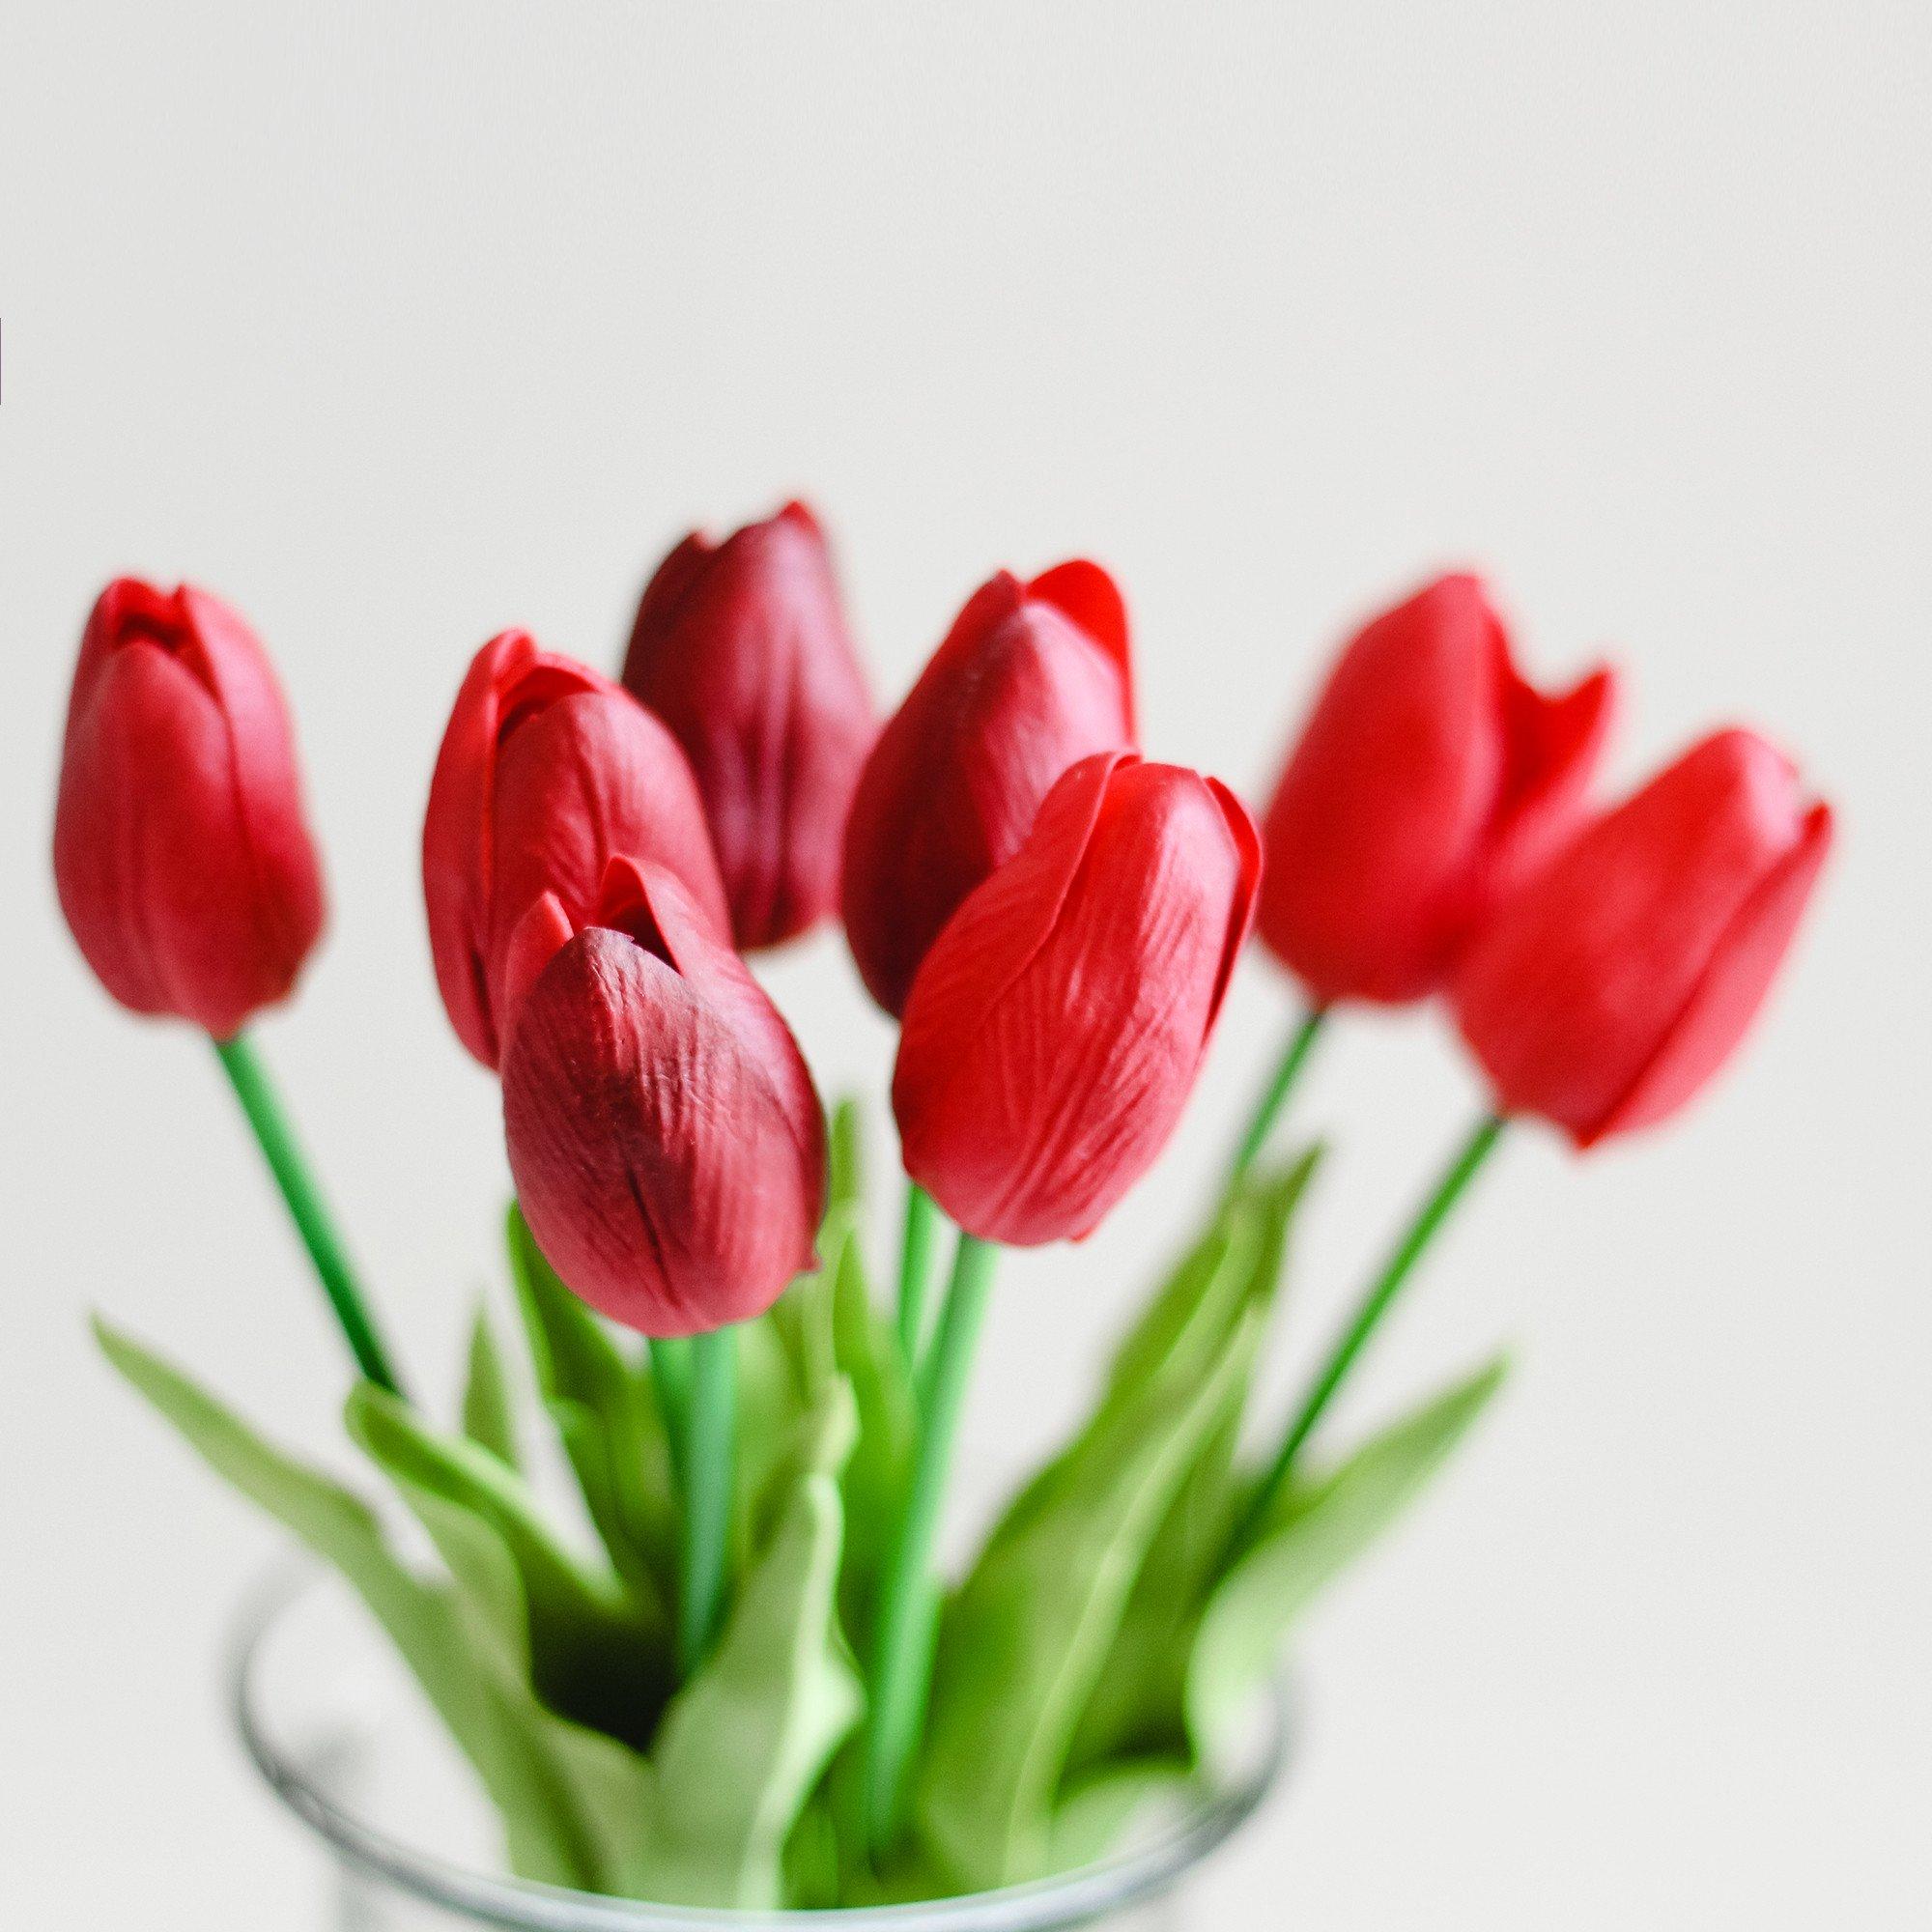 9pcs - 36pcs Mini Red Tulips Real Touch Silk Flowers - Lana Byanca ...